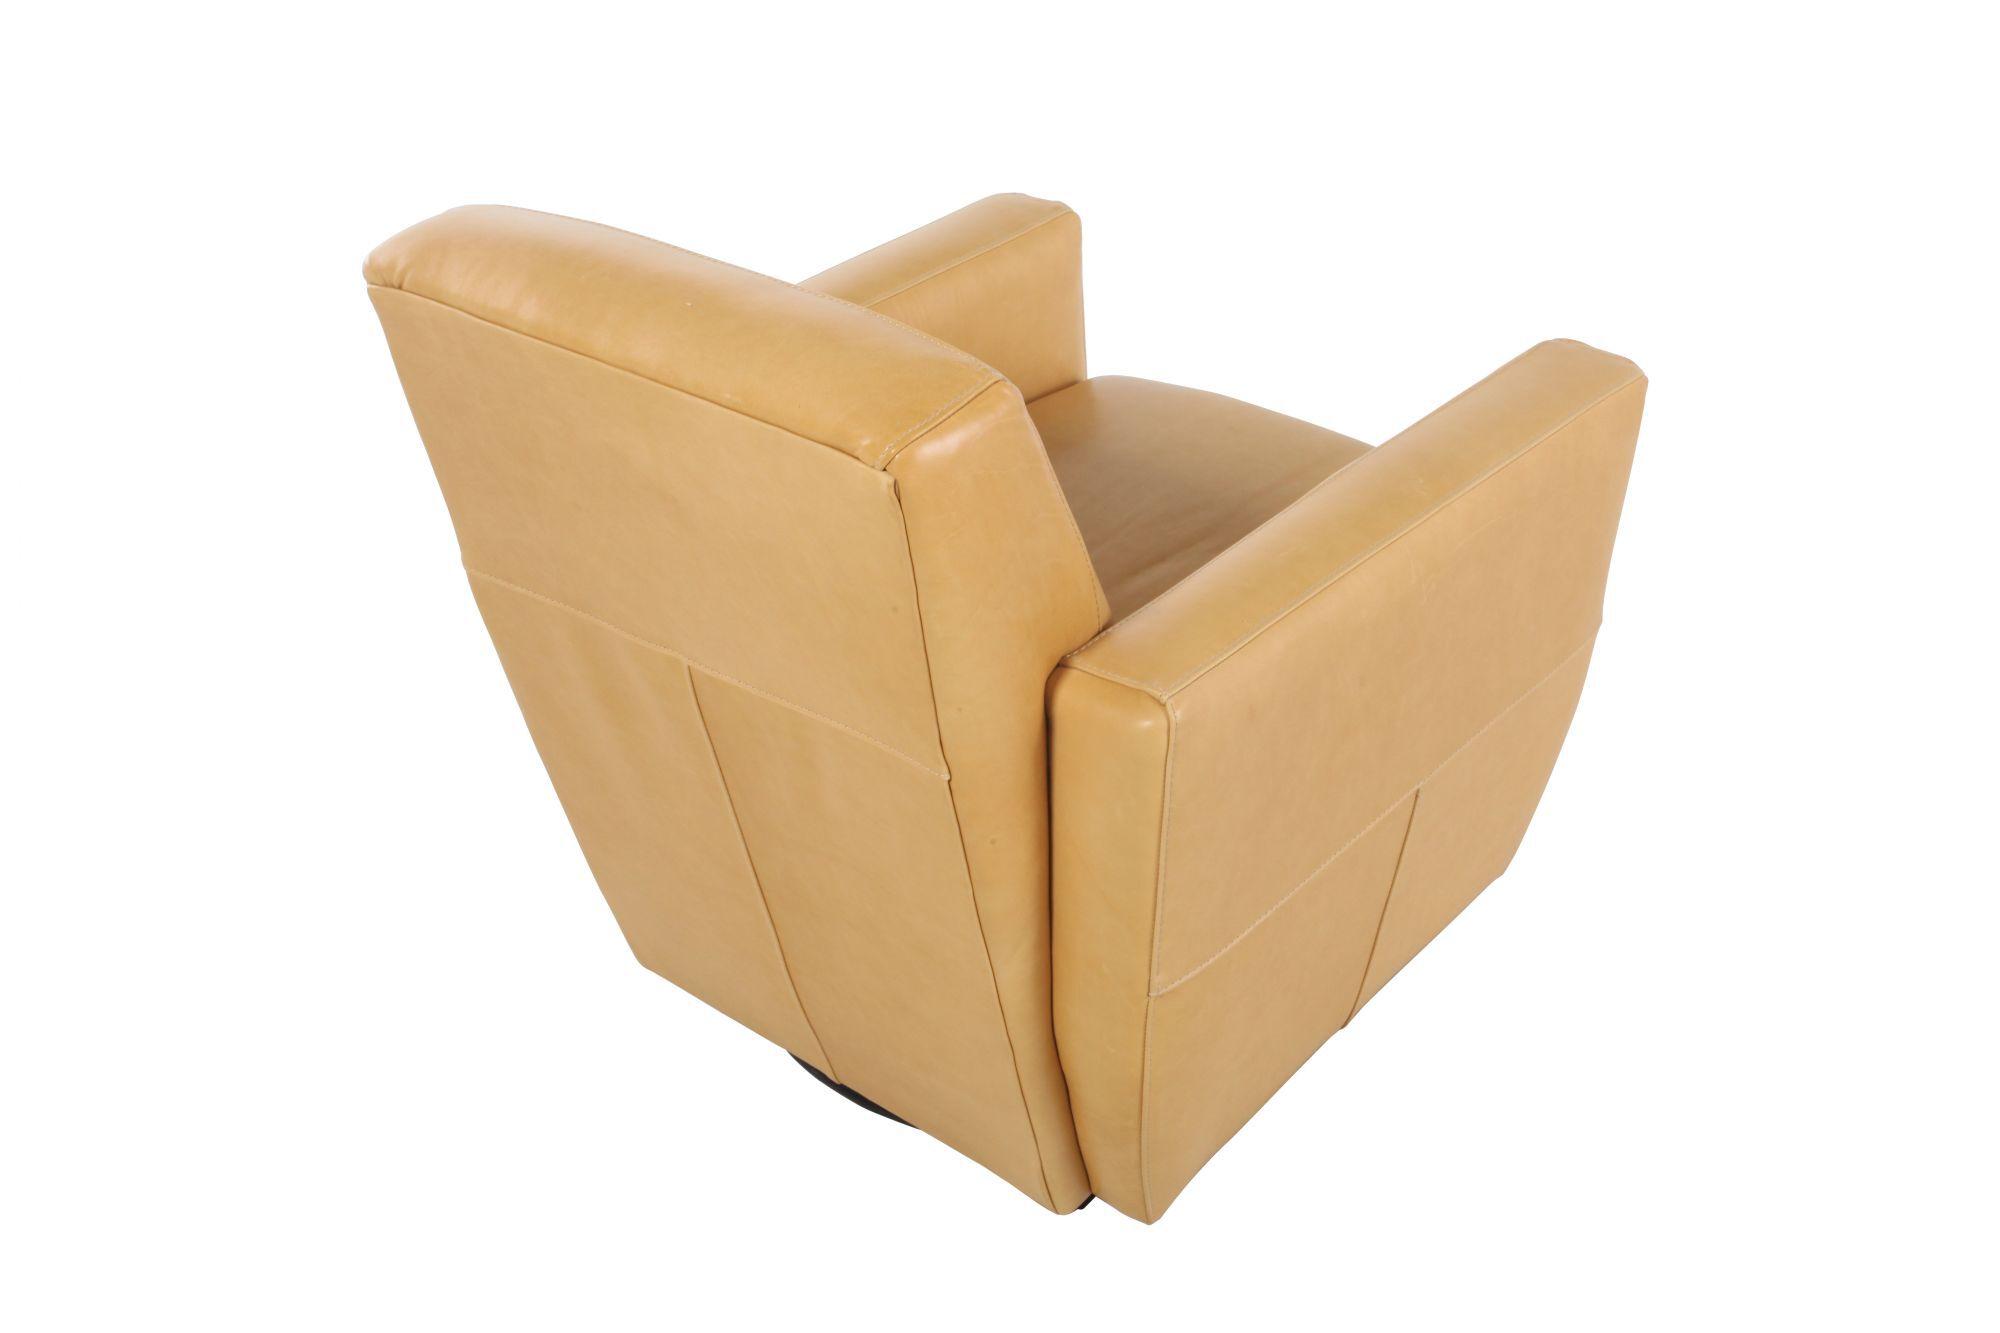 swivel chair vancouver baby swing seat jonathan louis juno mathis